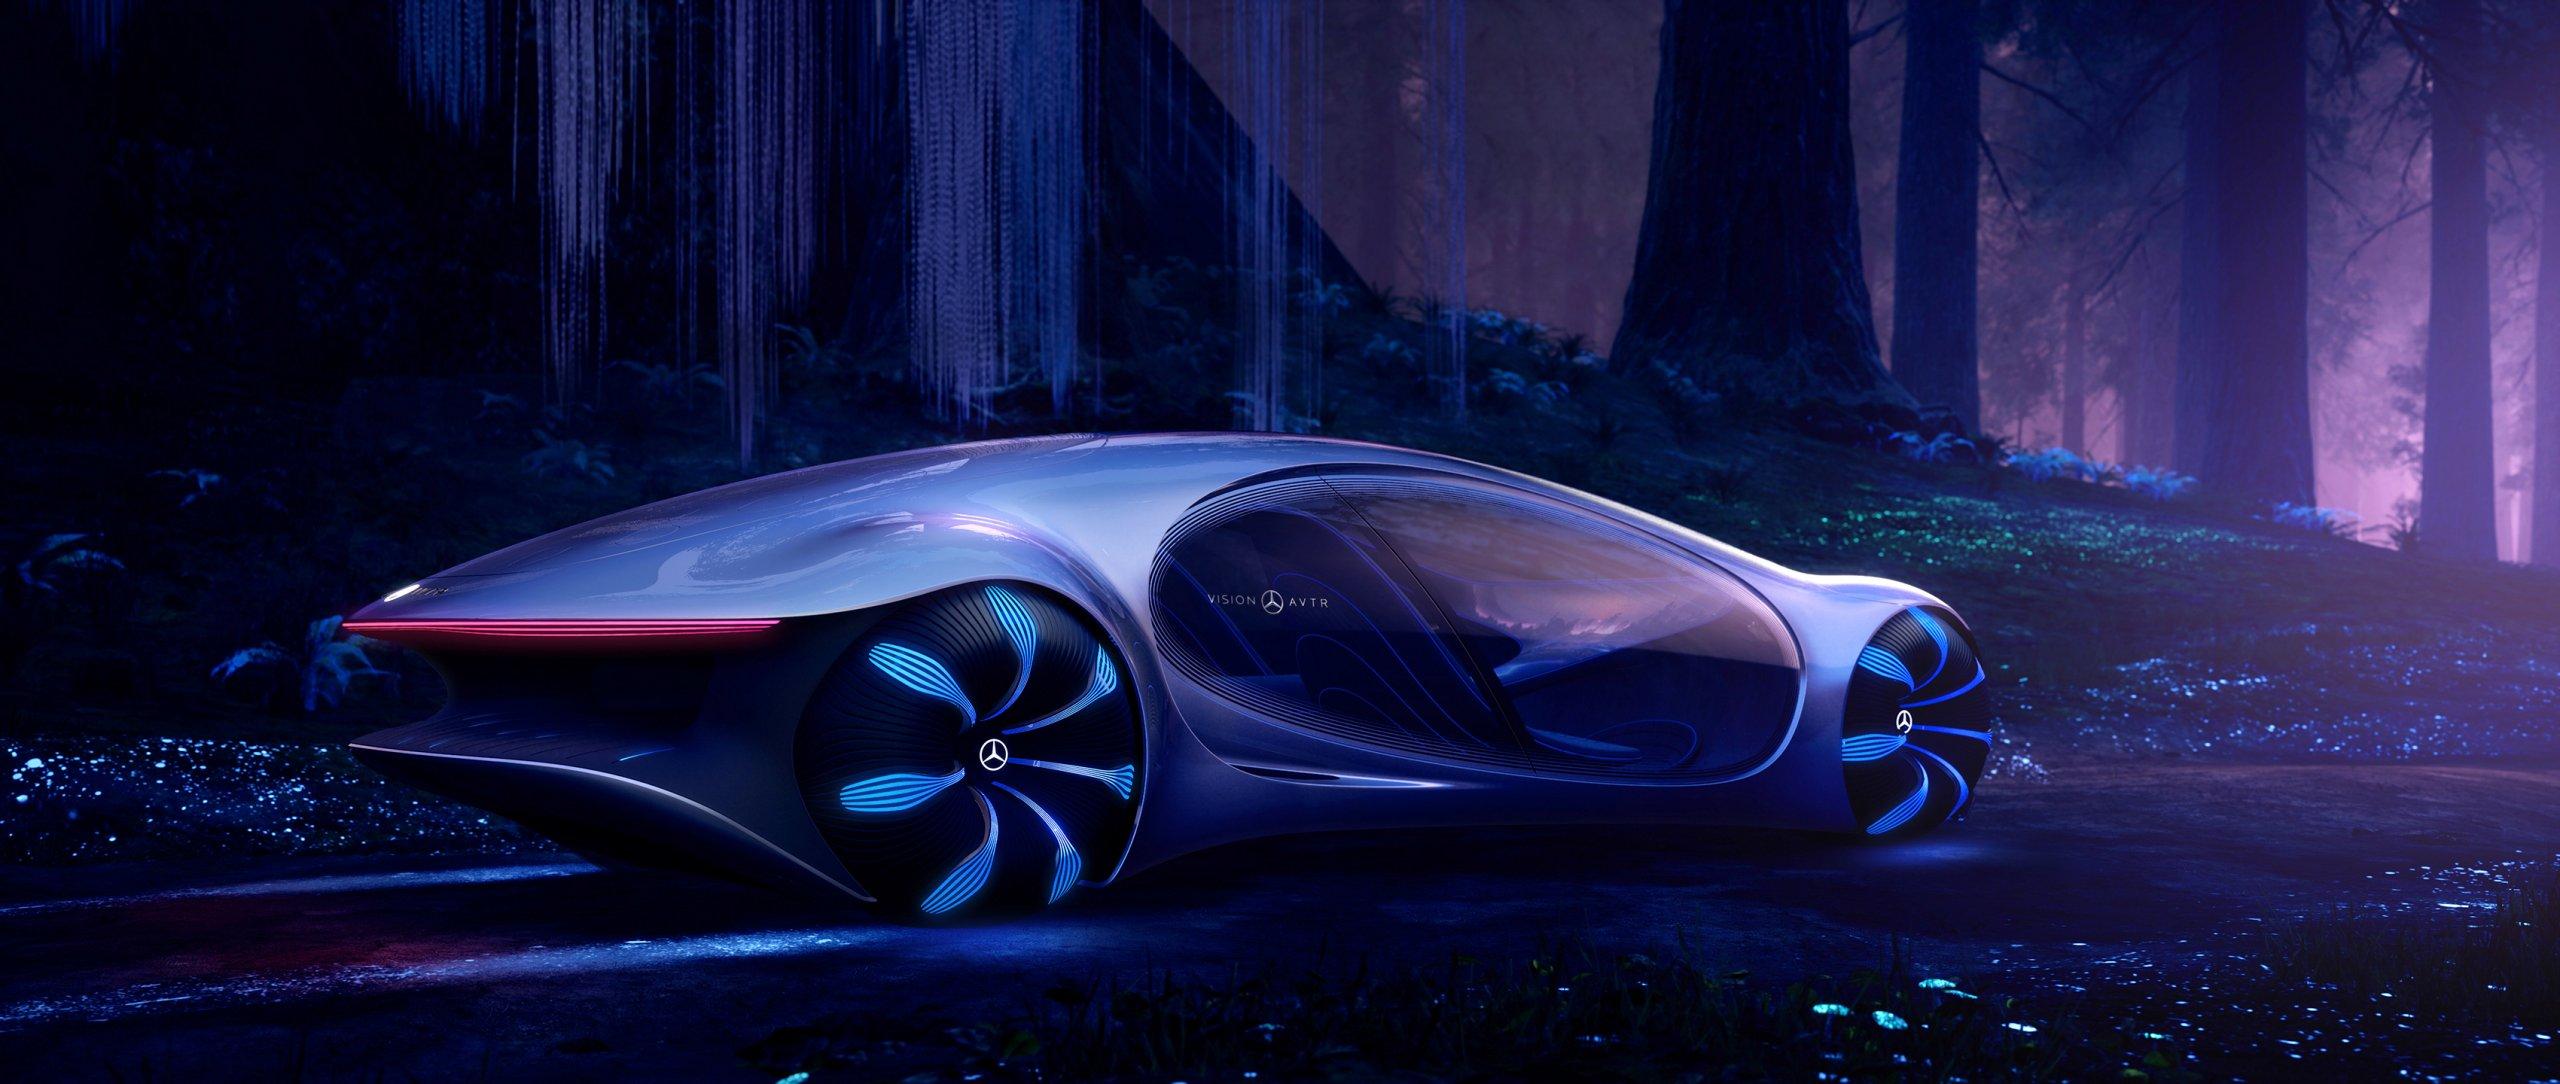 HD Mercedes-Benz VISION AVTR